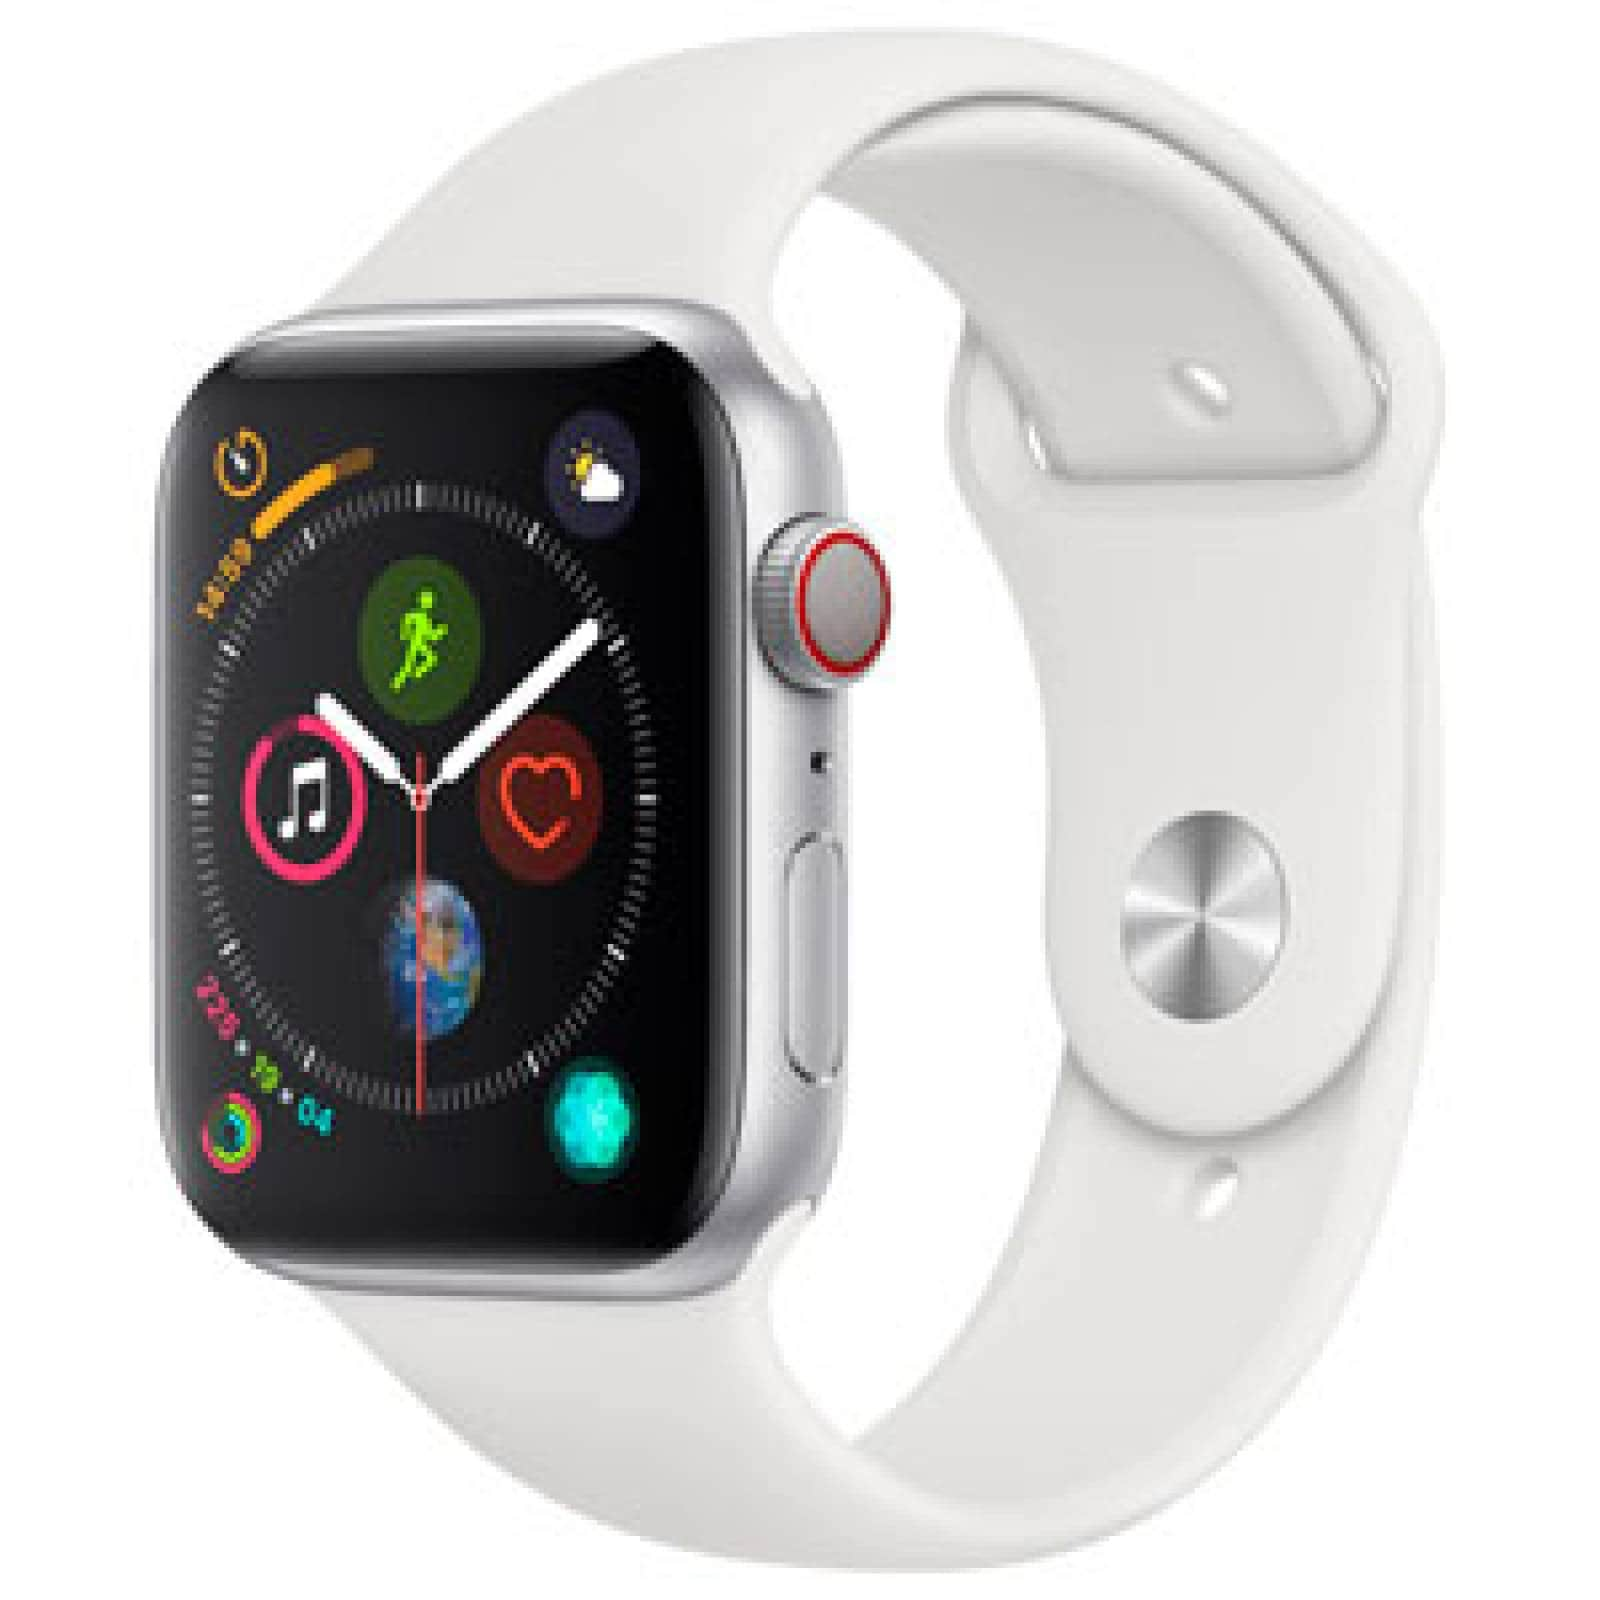 Apple Watch Series 4 Reloj Inteligente 44mm Nuevo Gps Plata